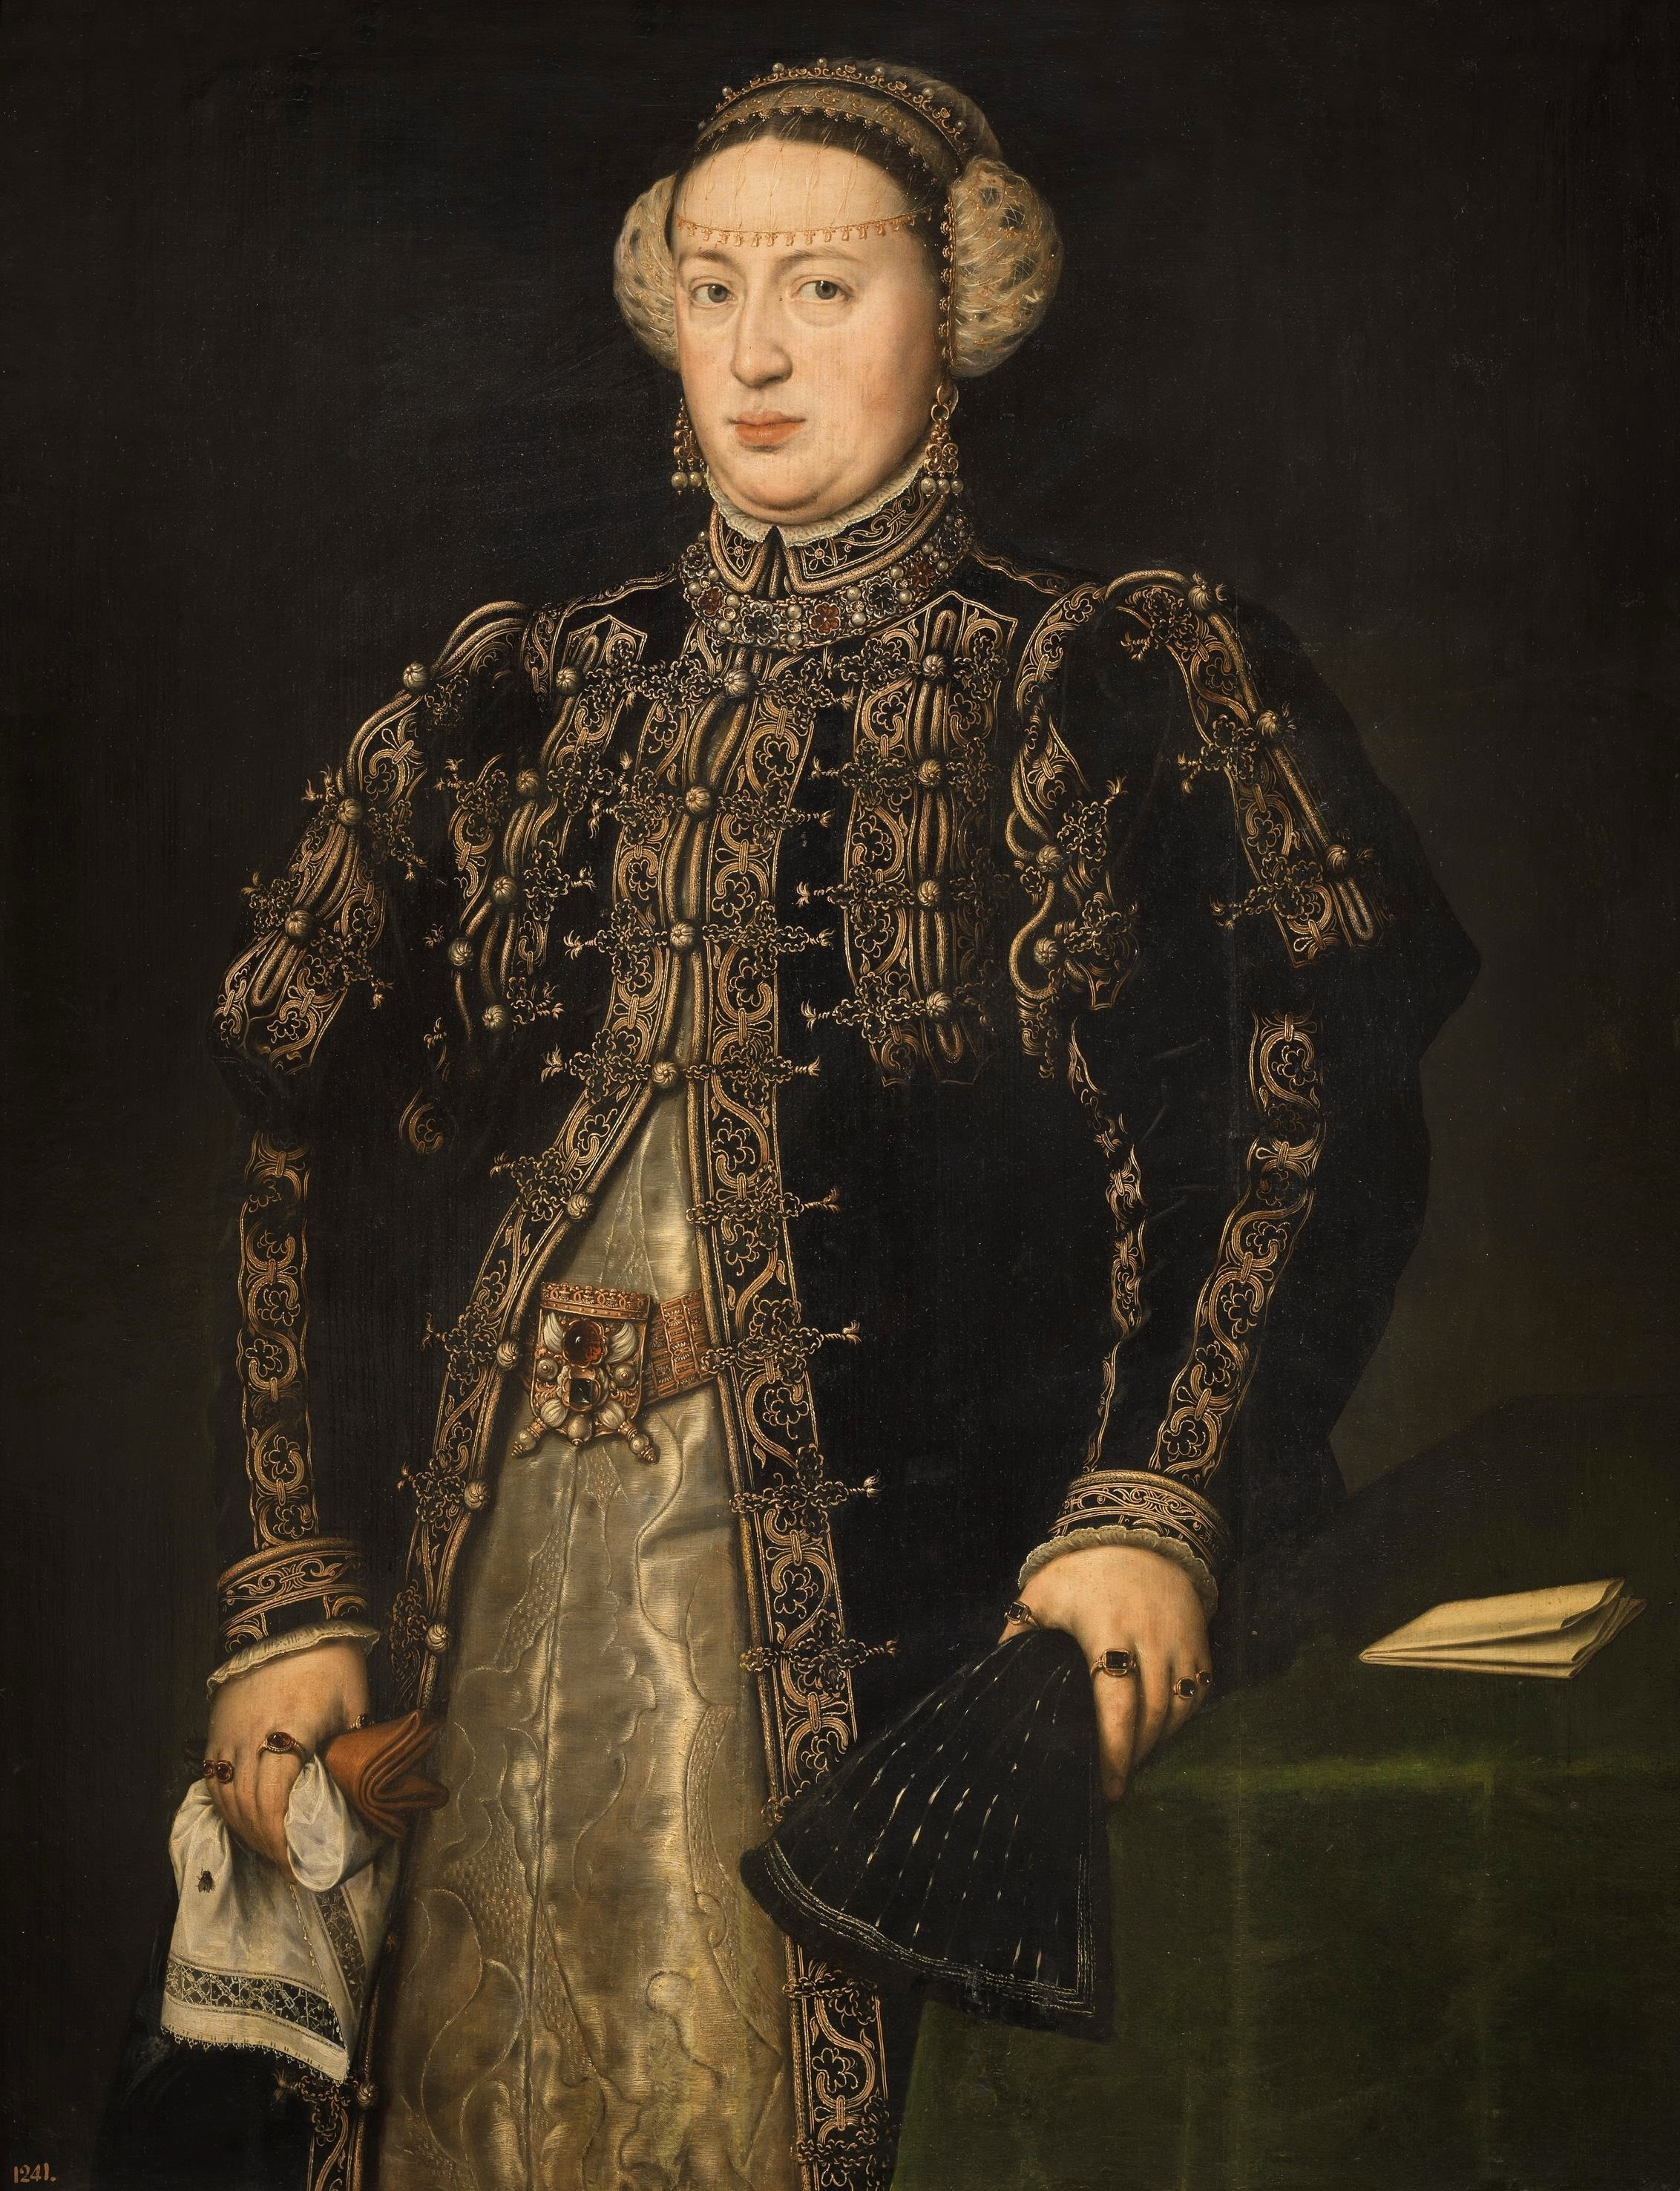 Ficheiro:Infanta Caterina of Spain.jpg